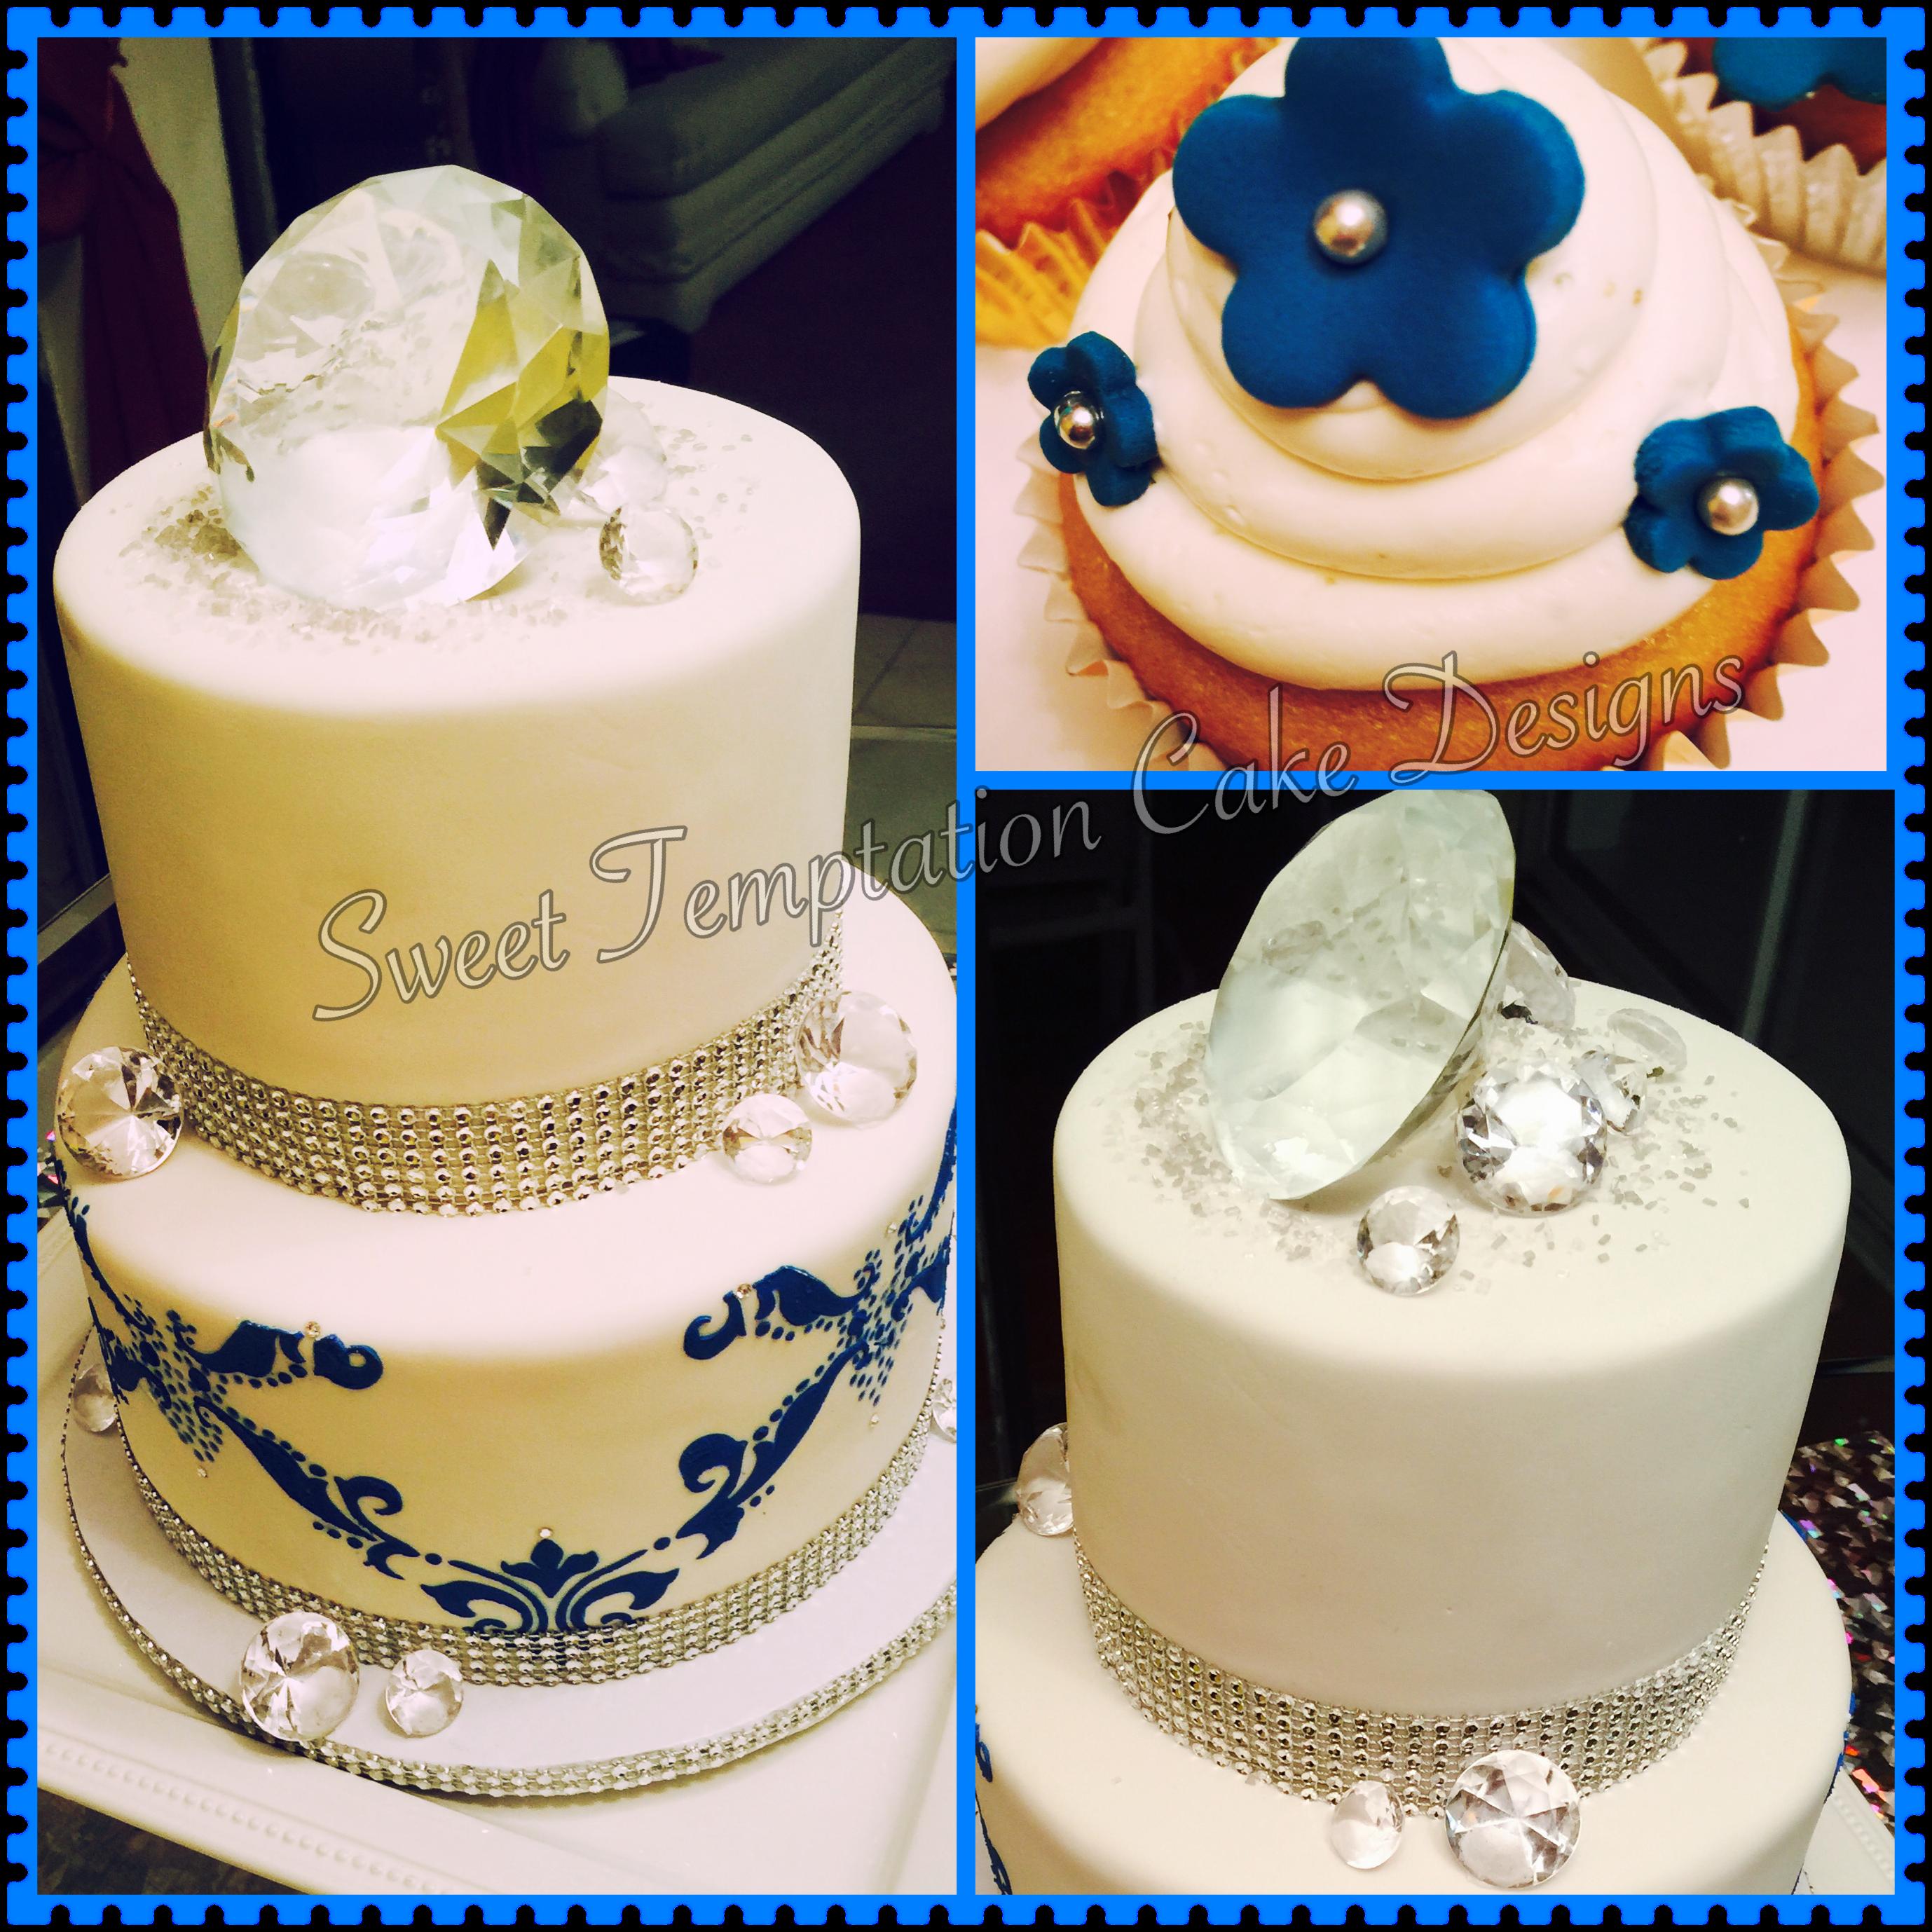 Gallery sugar rush follow. Factory clipart cake